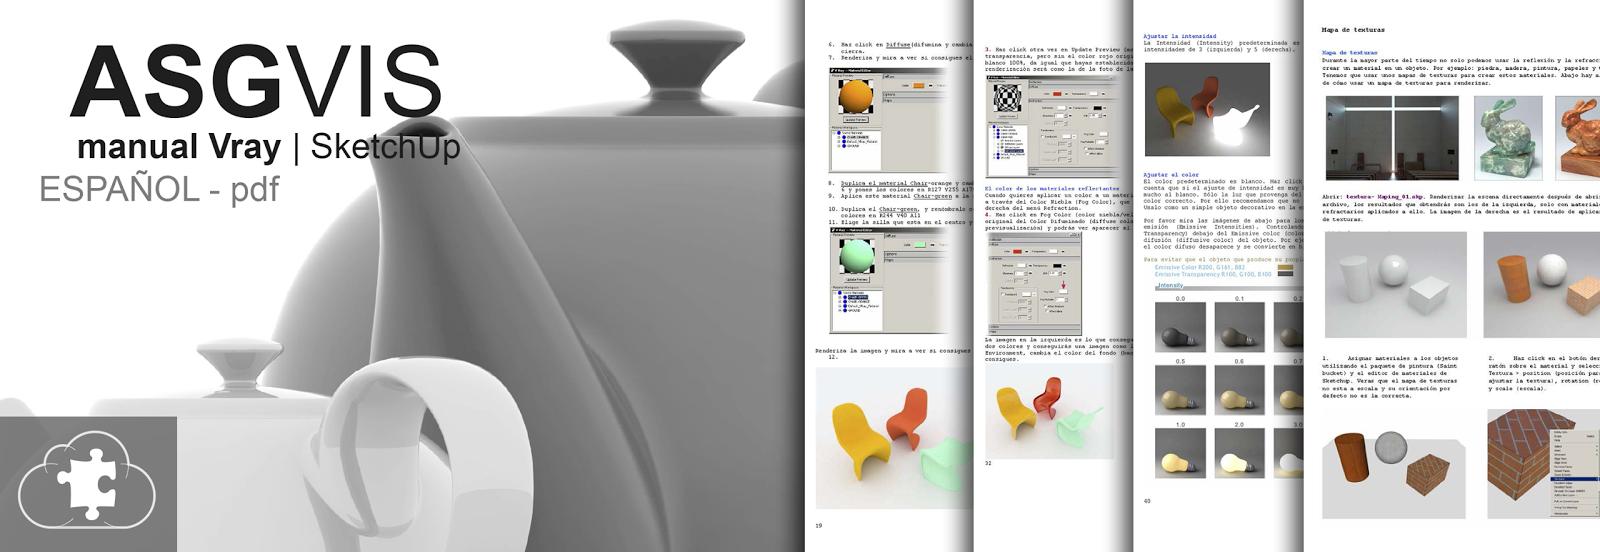 manual Vray | SketchUp | ASGVIS | pdf - ESPAÑOL